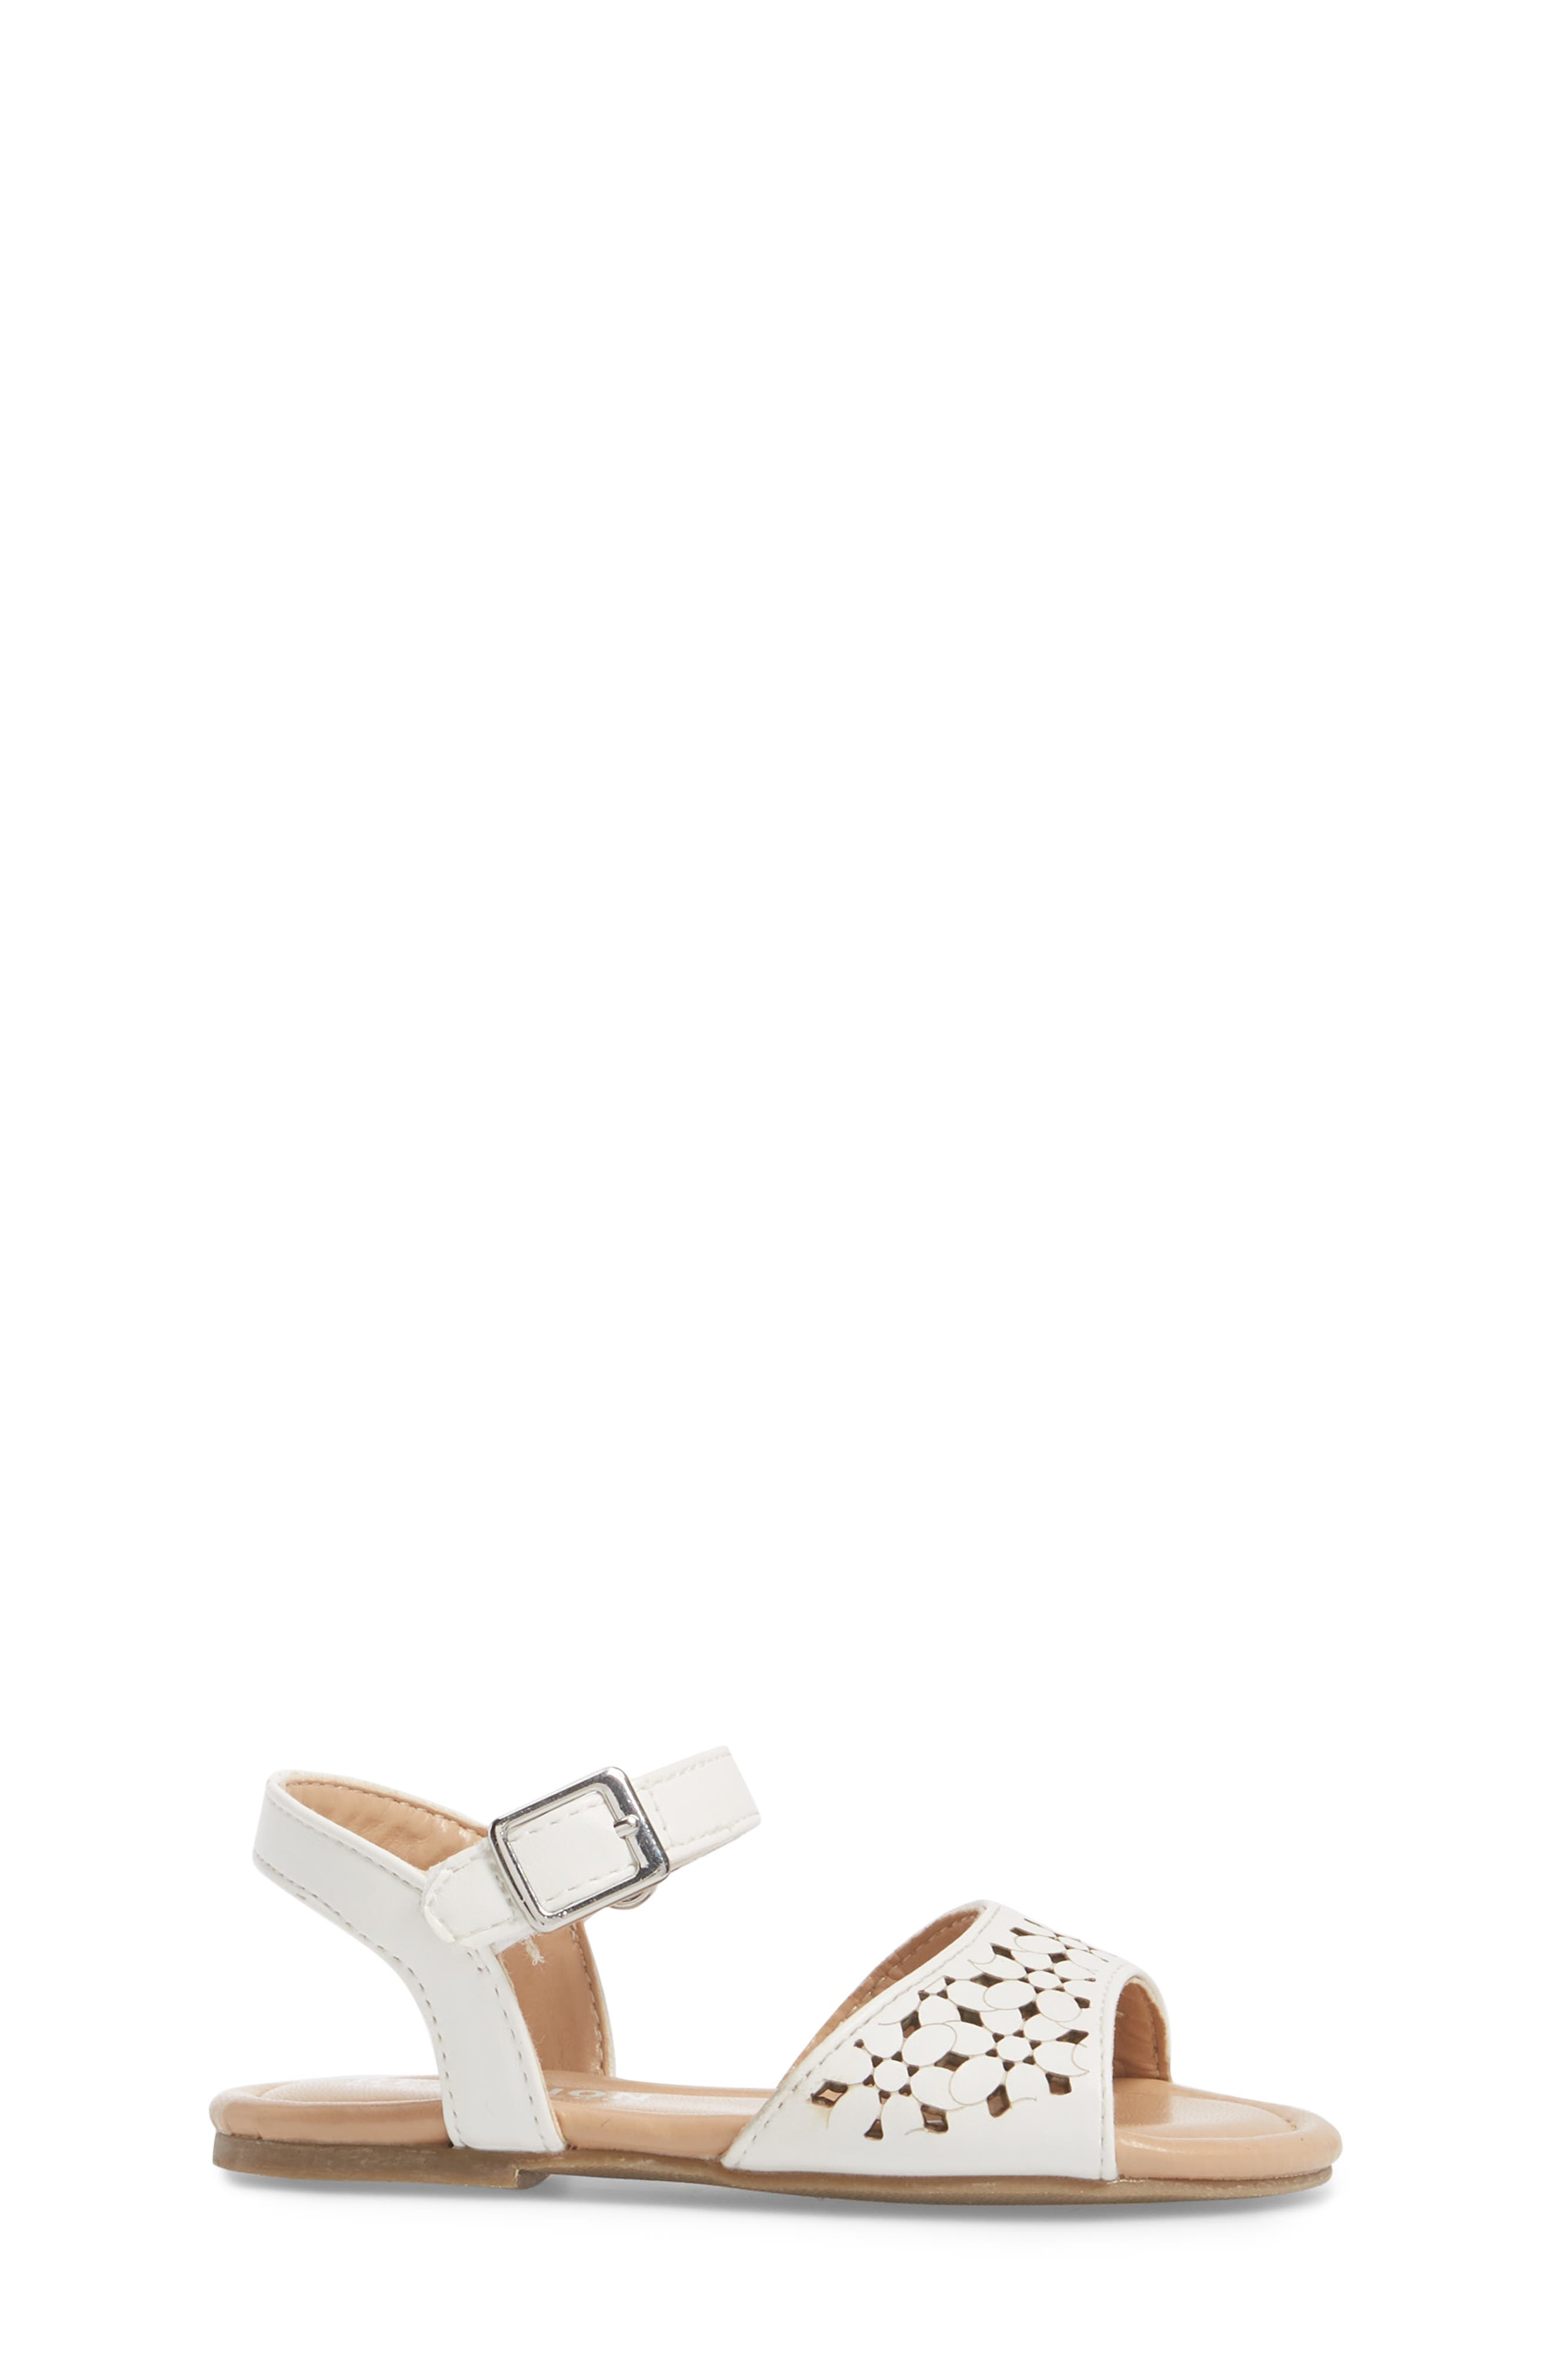 Kiera Perforated Sandal,                             Alternate thumbnail 3, color,                             100